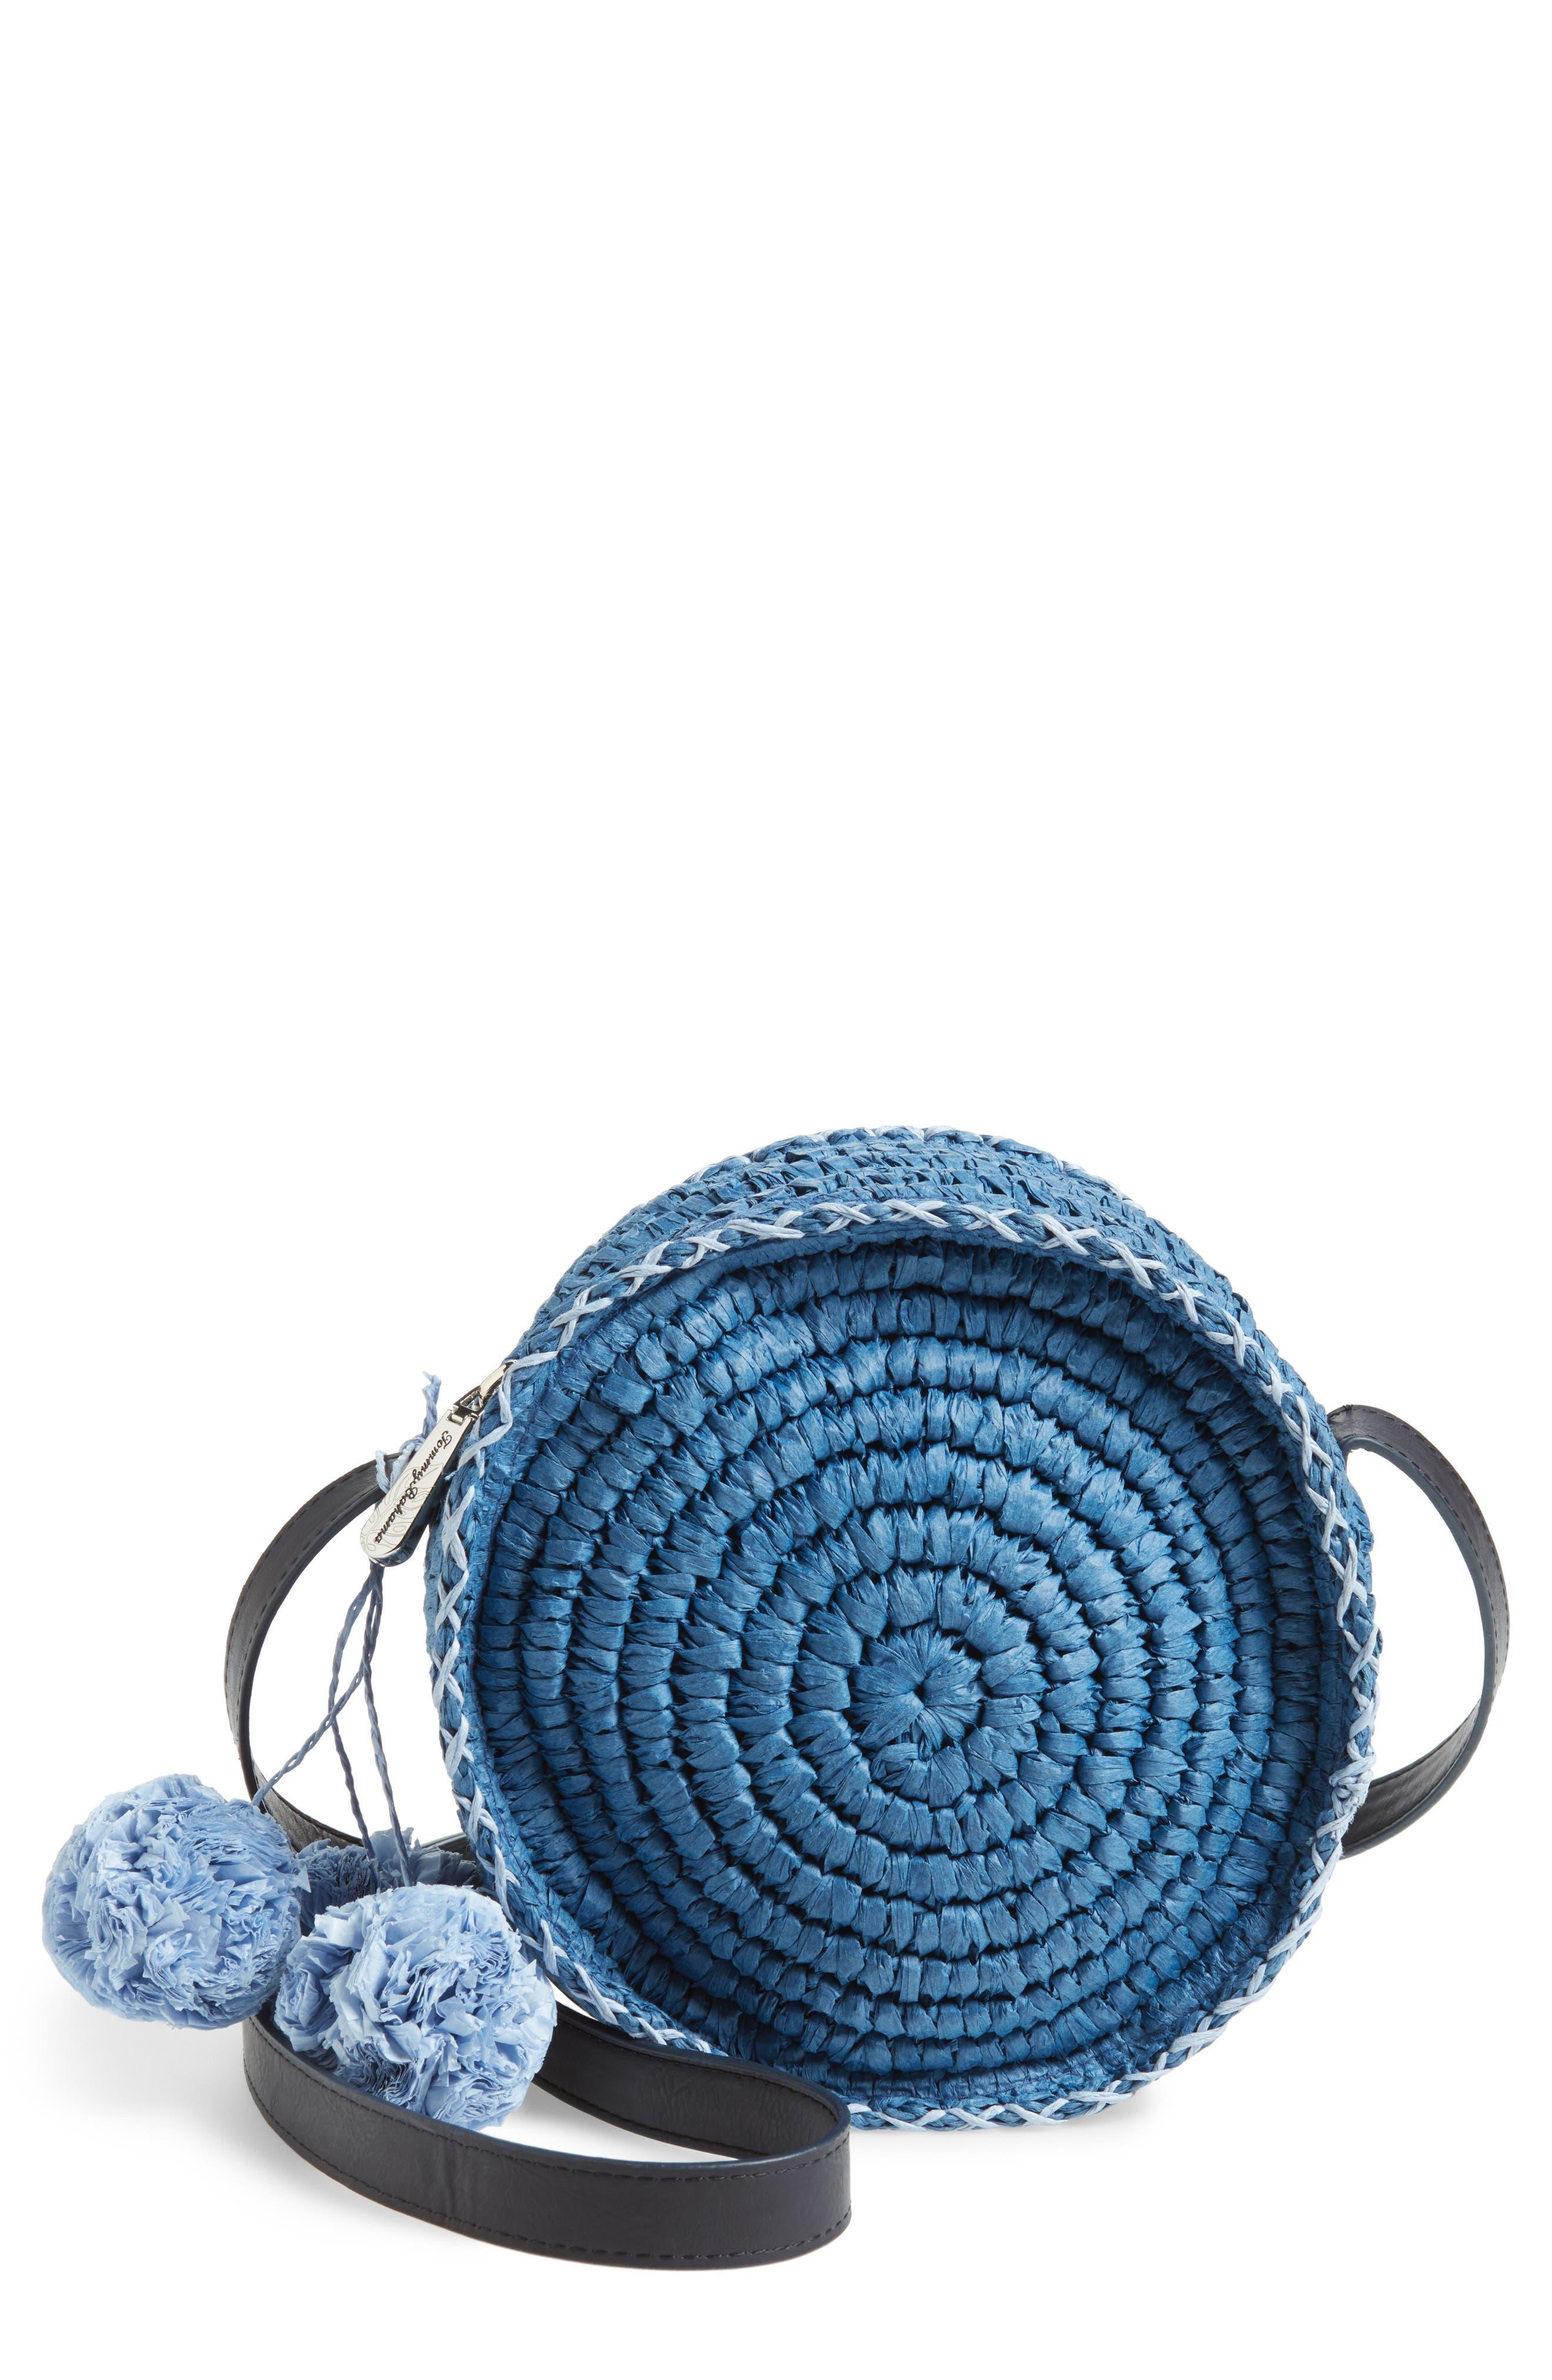 Pirro Woven Straw Crossbody Bag,                             Main thumbnail 1, color,                             Navy